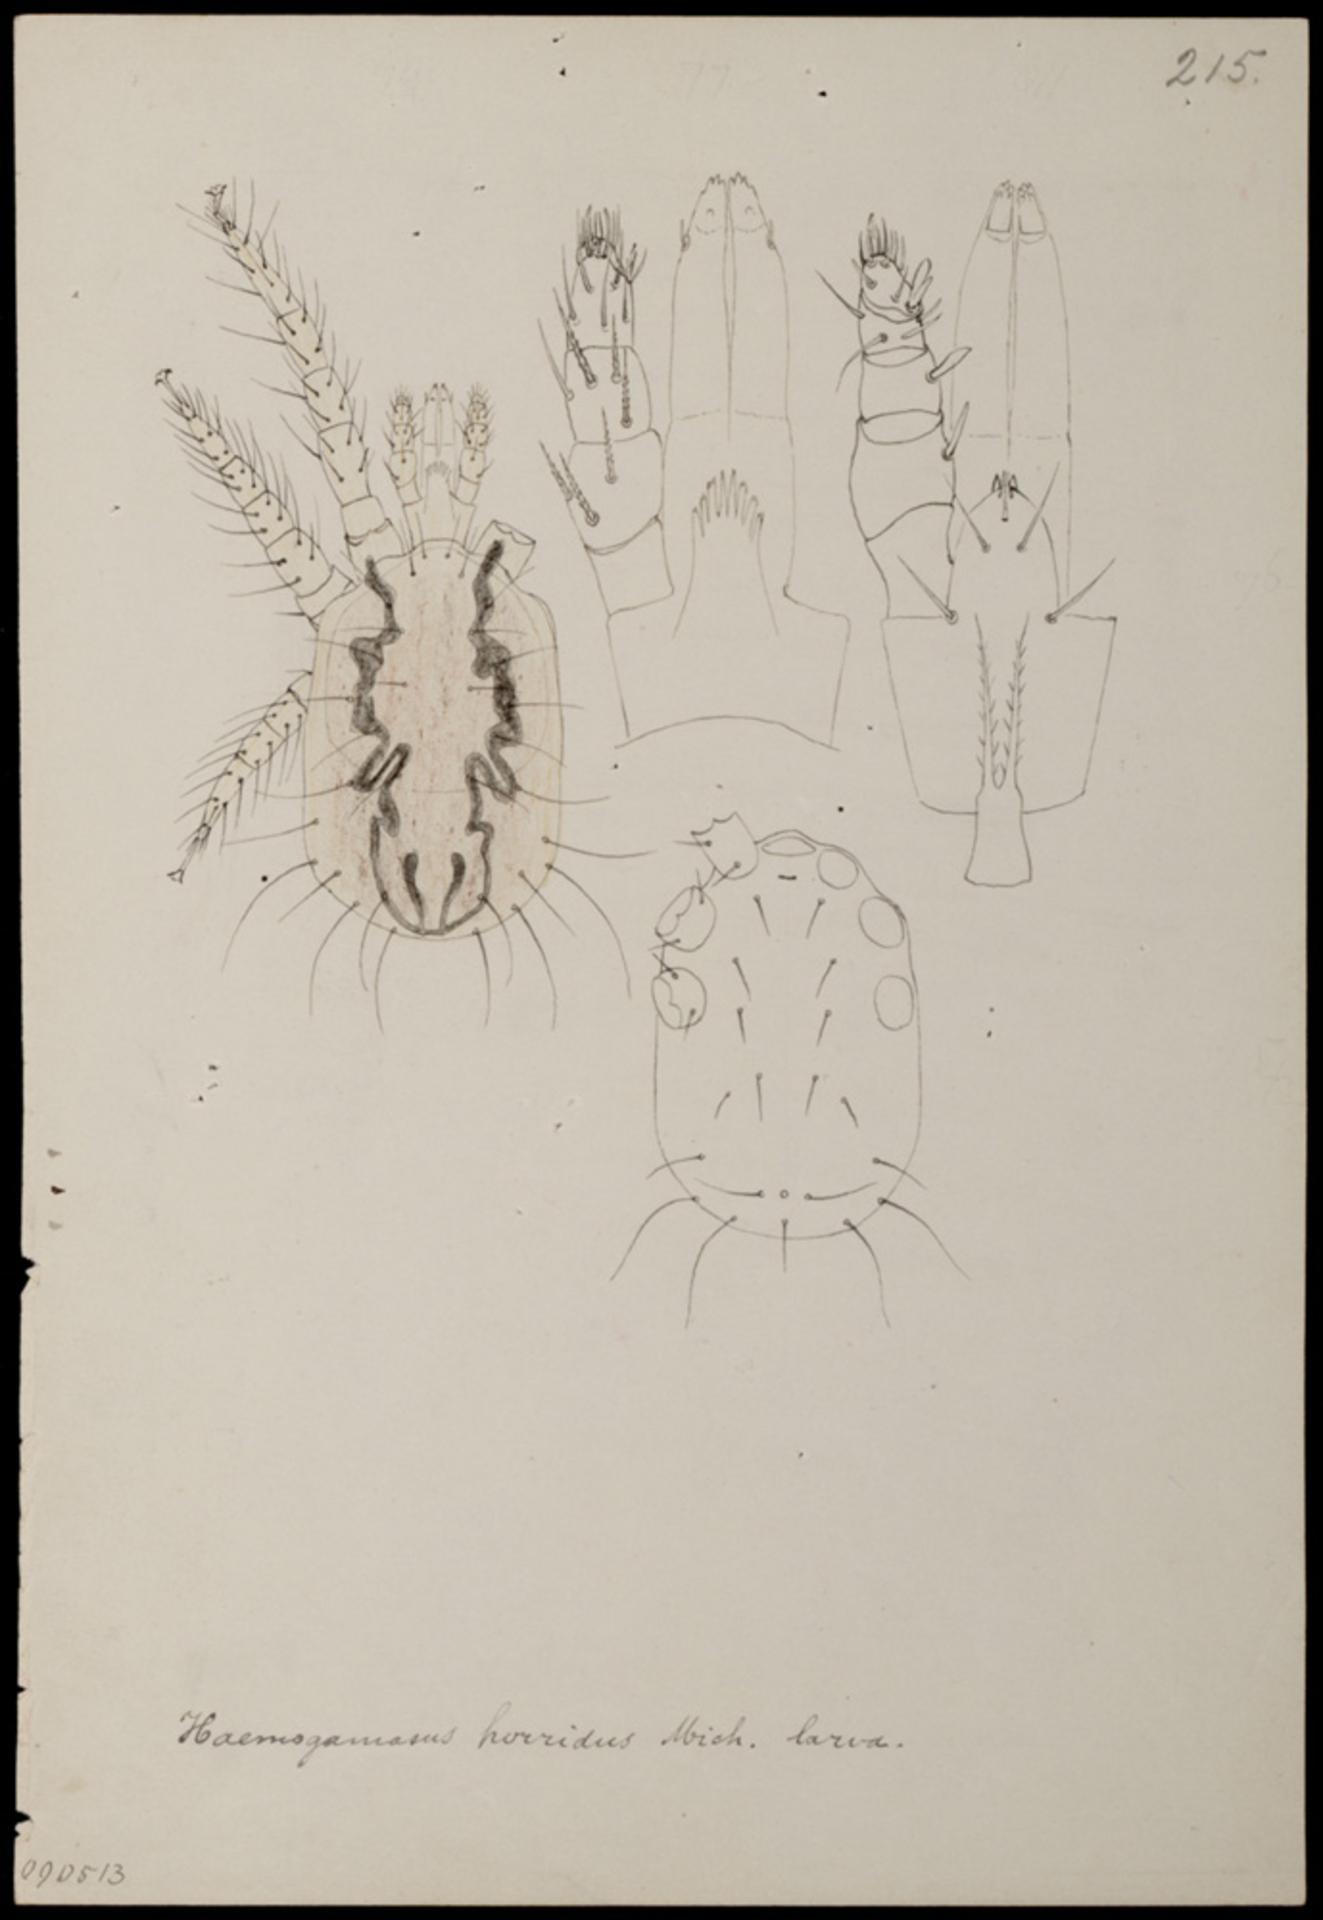 RMNH.ART.1061 | Haemogamasus horridus (Michael)